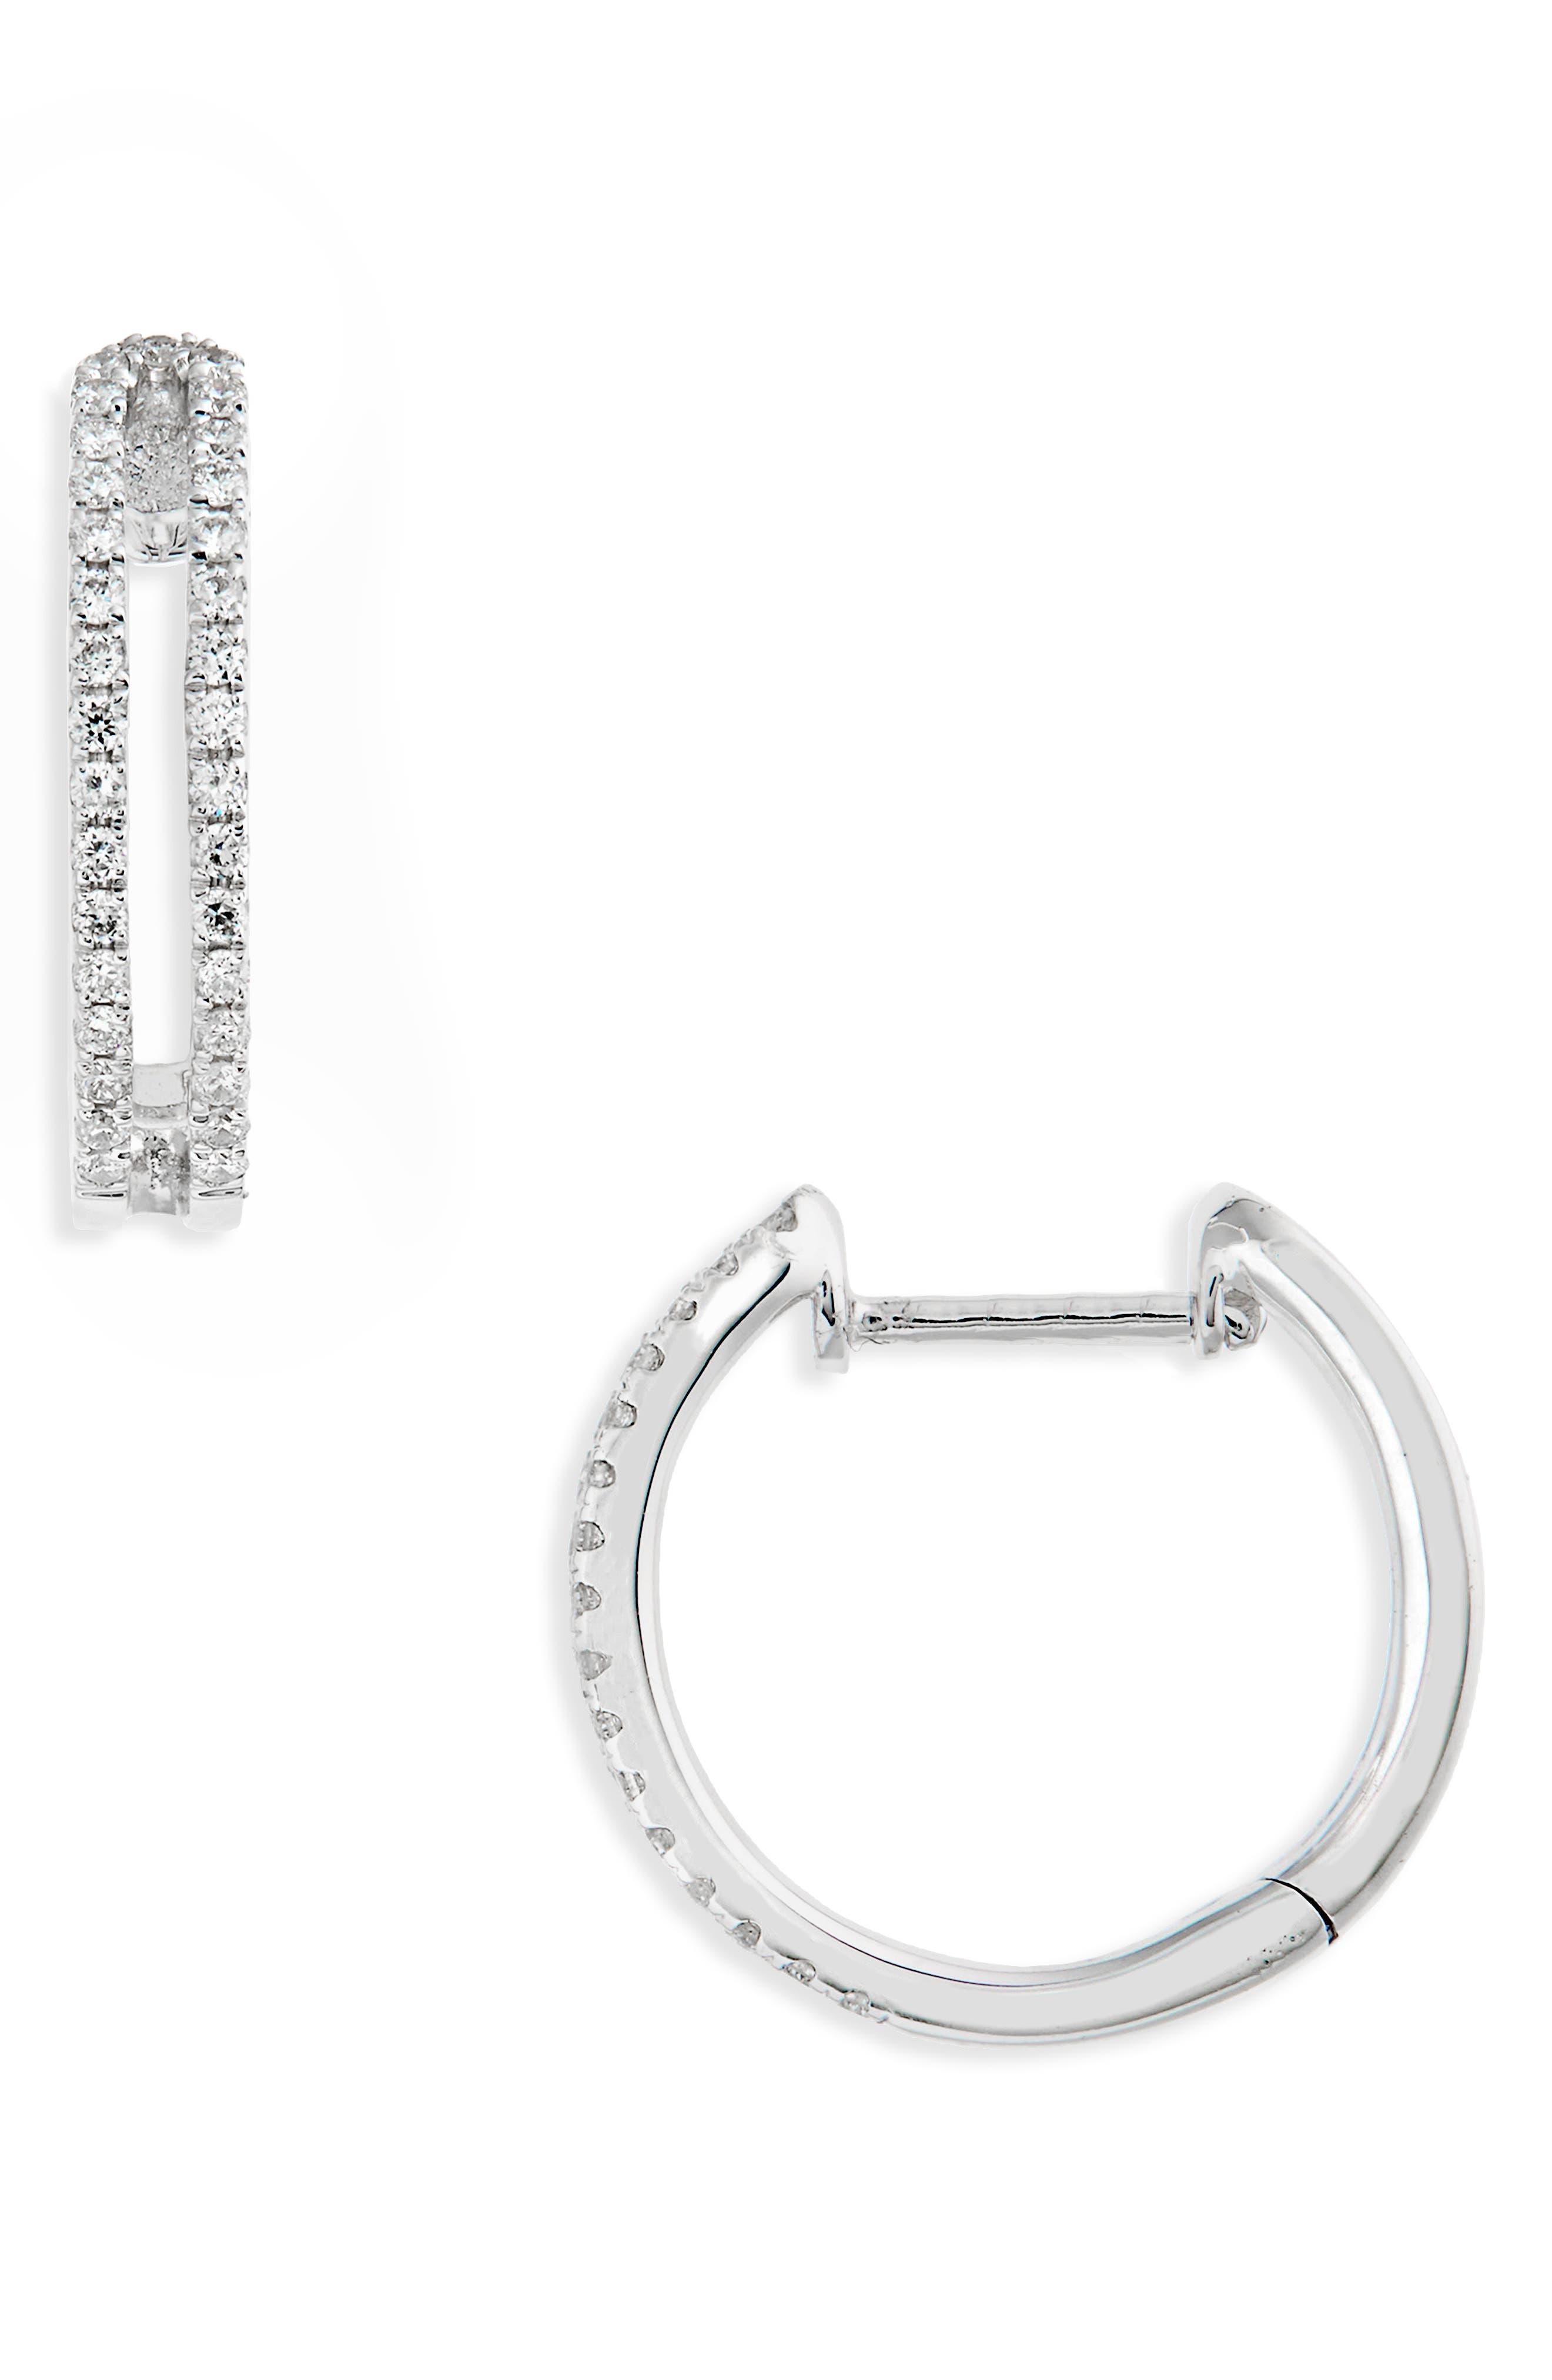 Geo Diamond Hoop Earrings,                         Main,                         color, White Gold